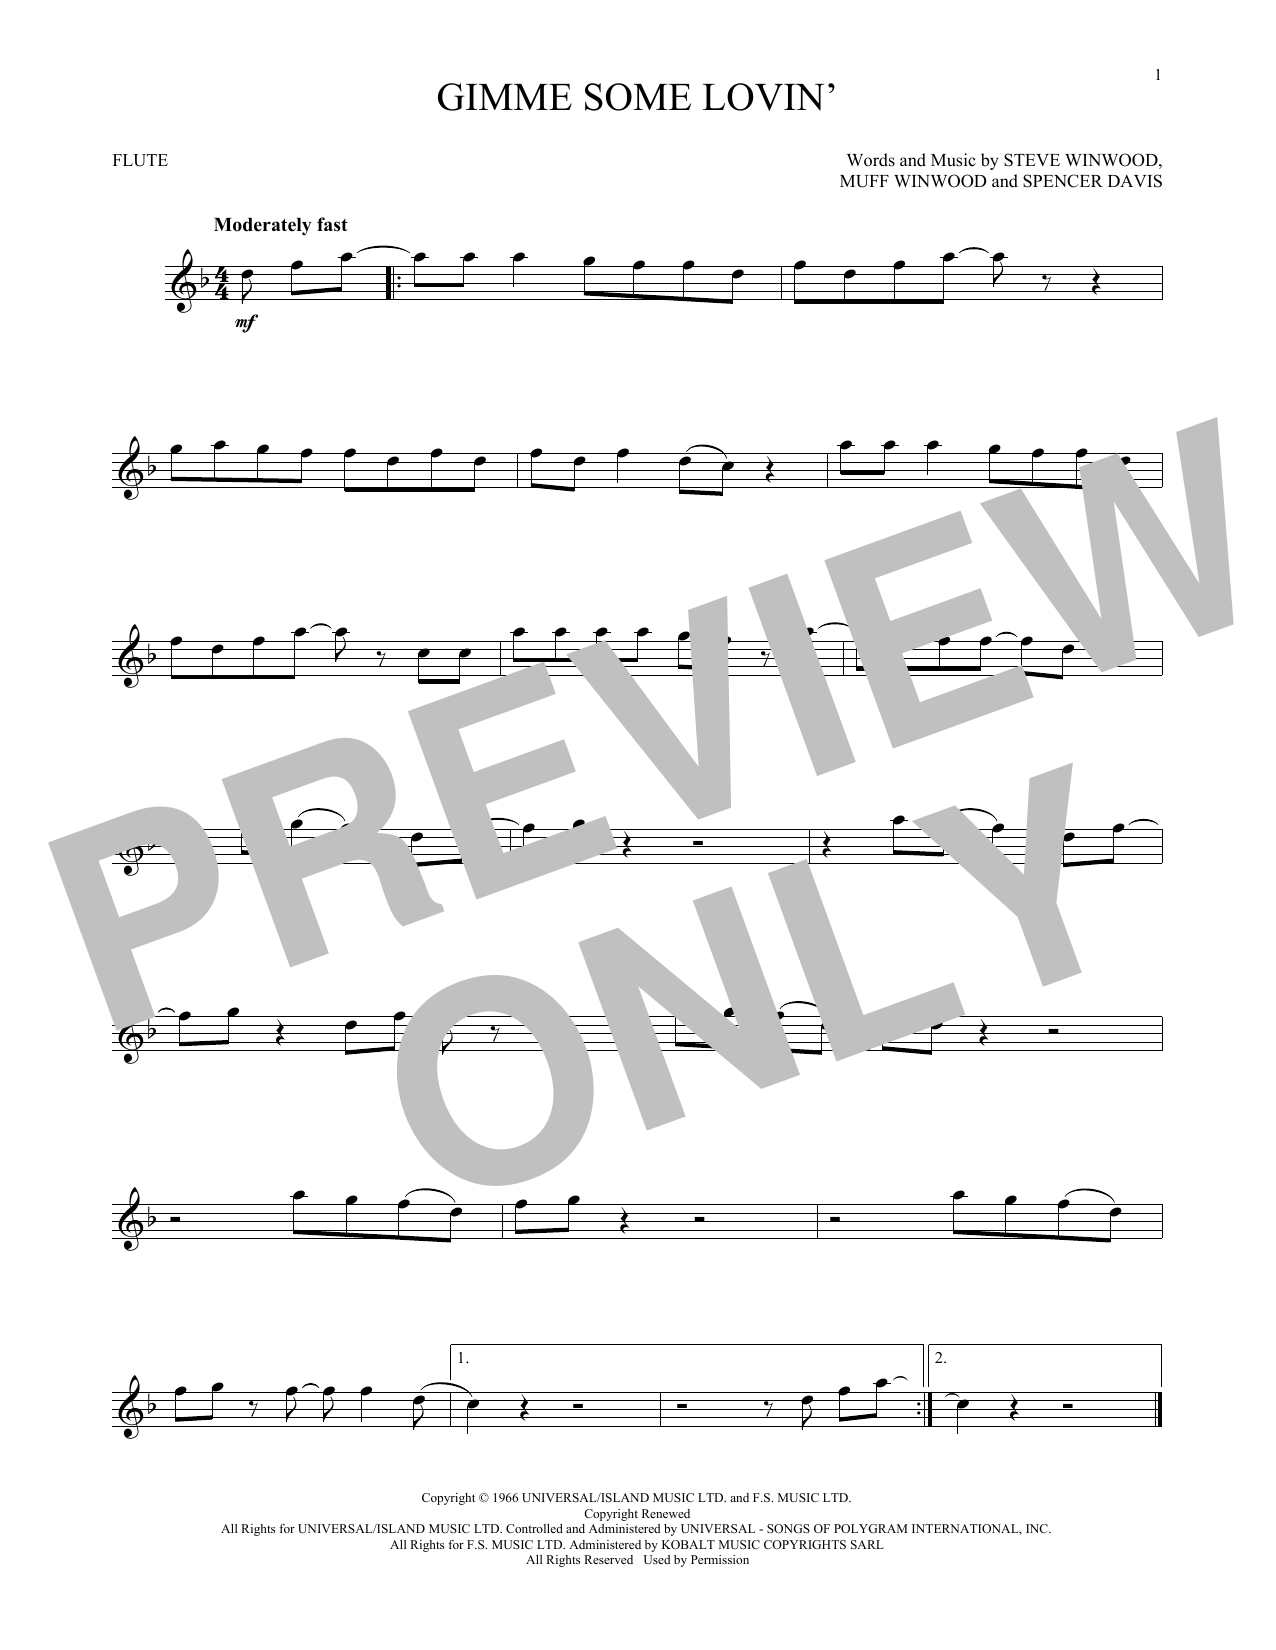 Gimme Some Lovin' (Flute Solo)